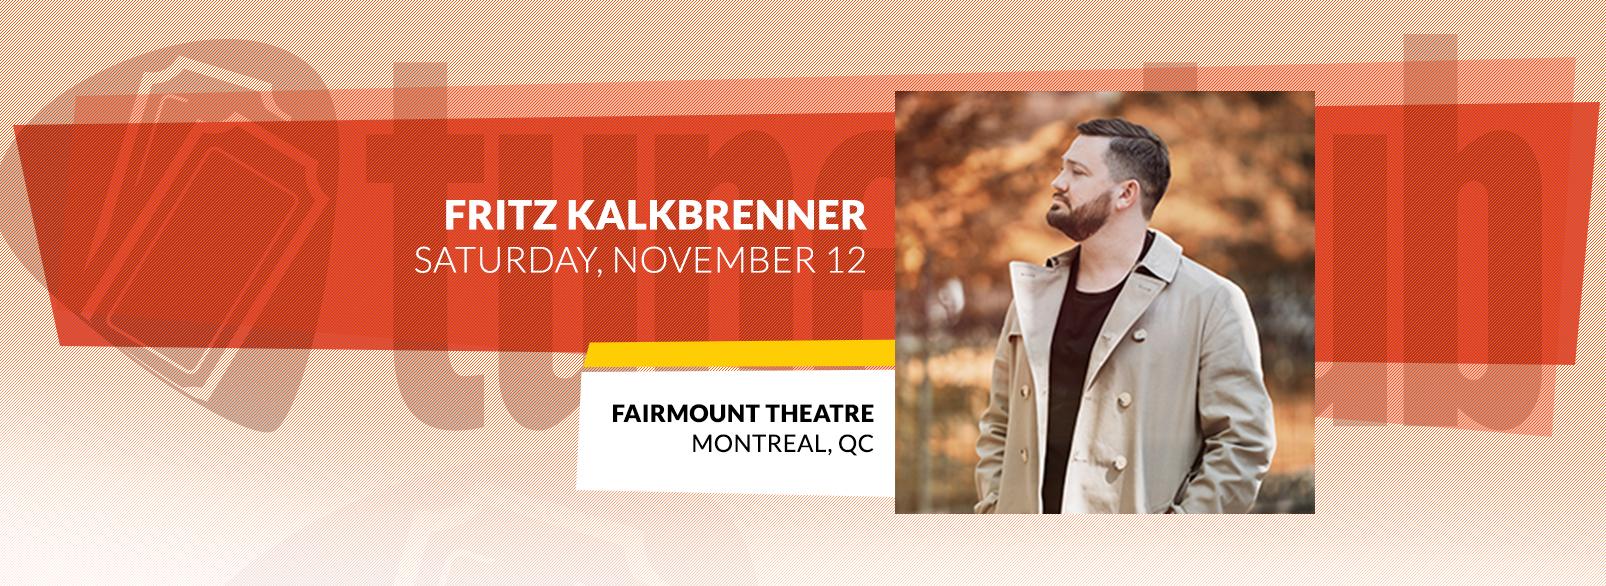 Fritz Kalkbrenner @ Fairmount Theatre